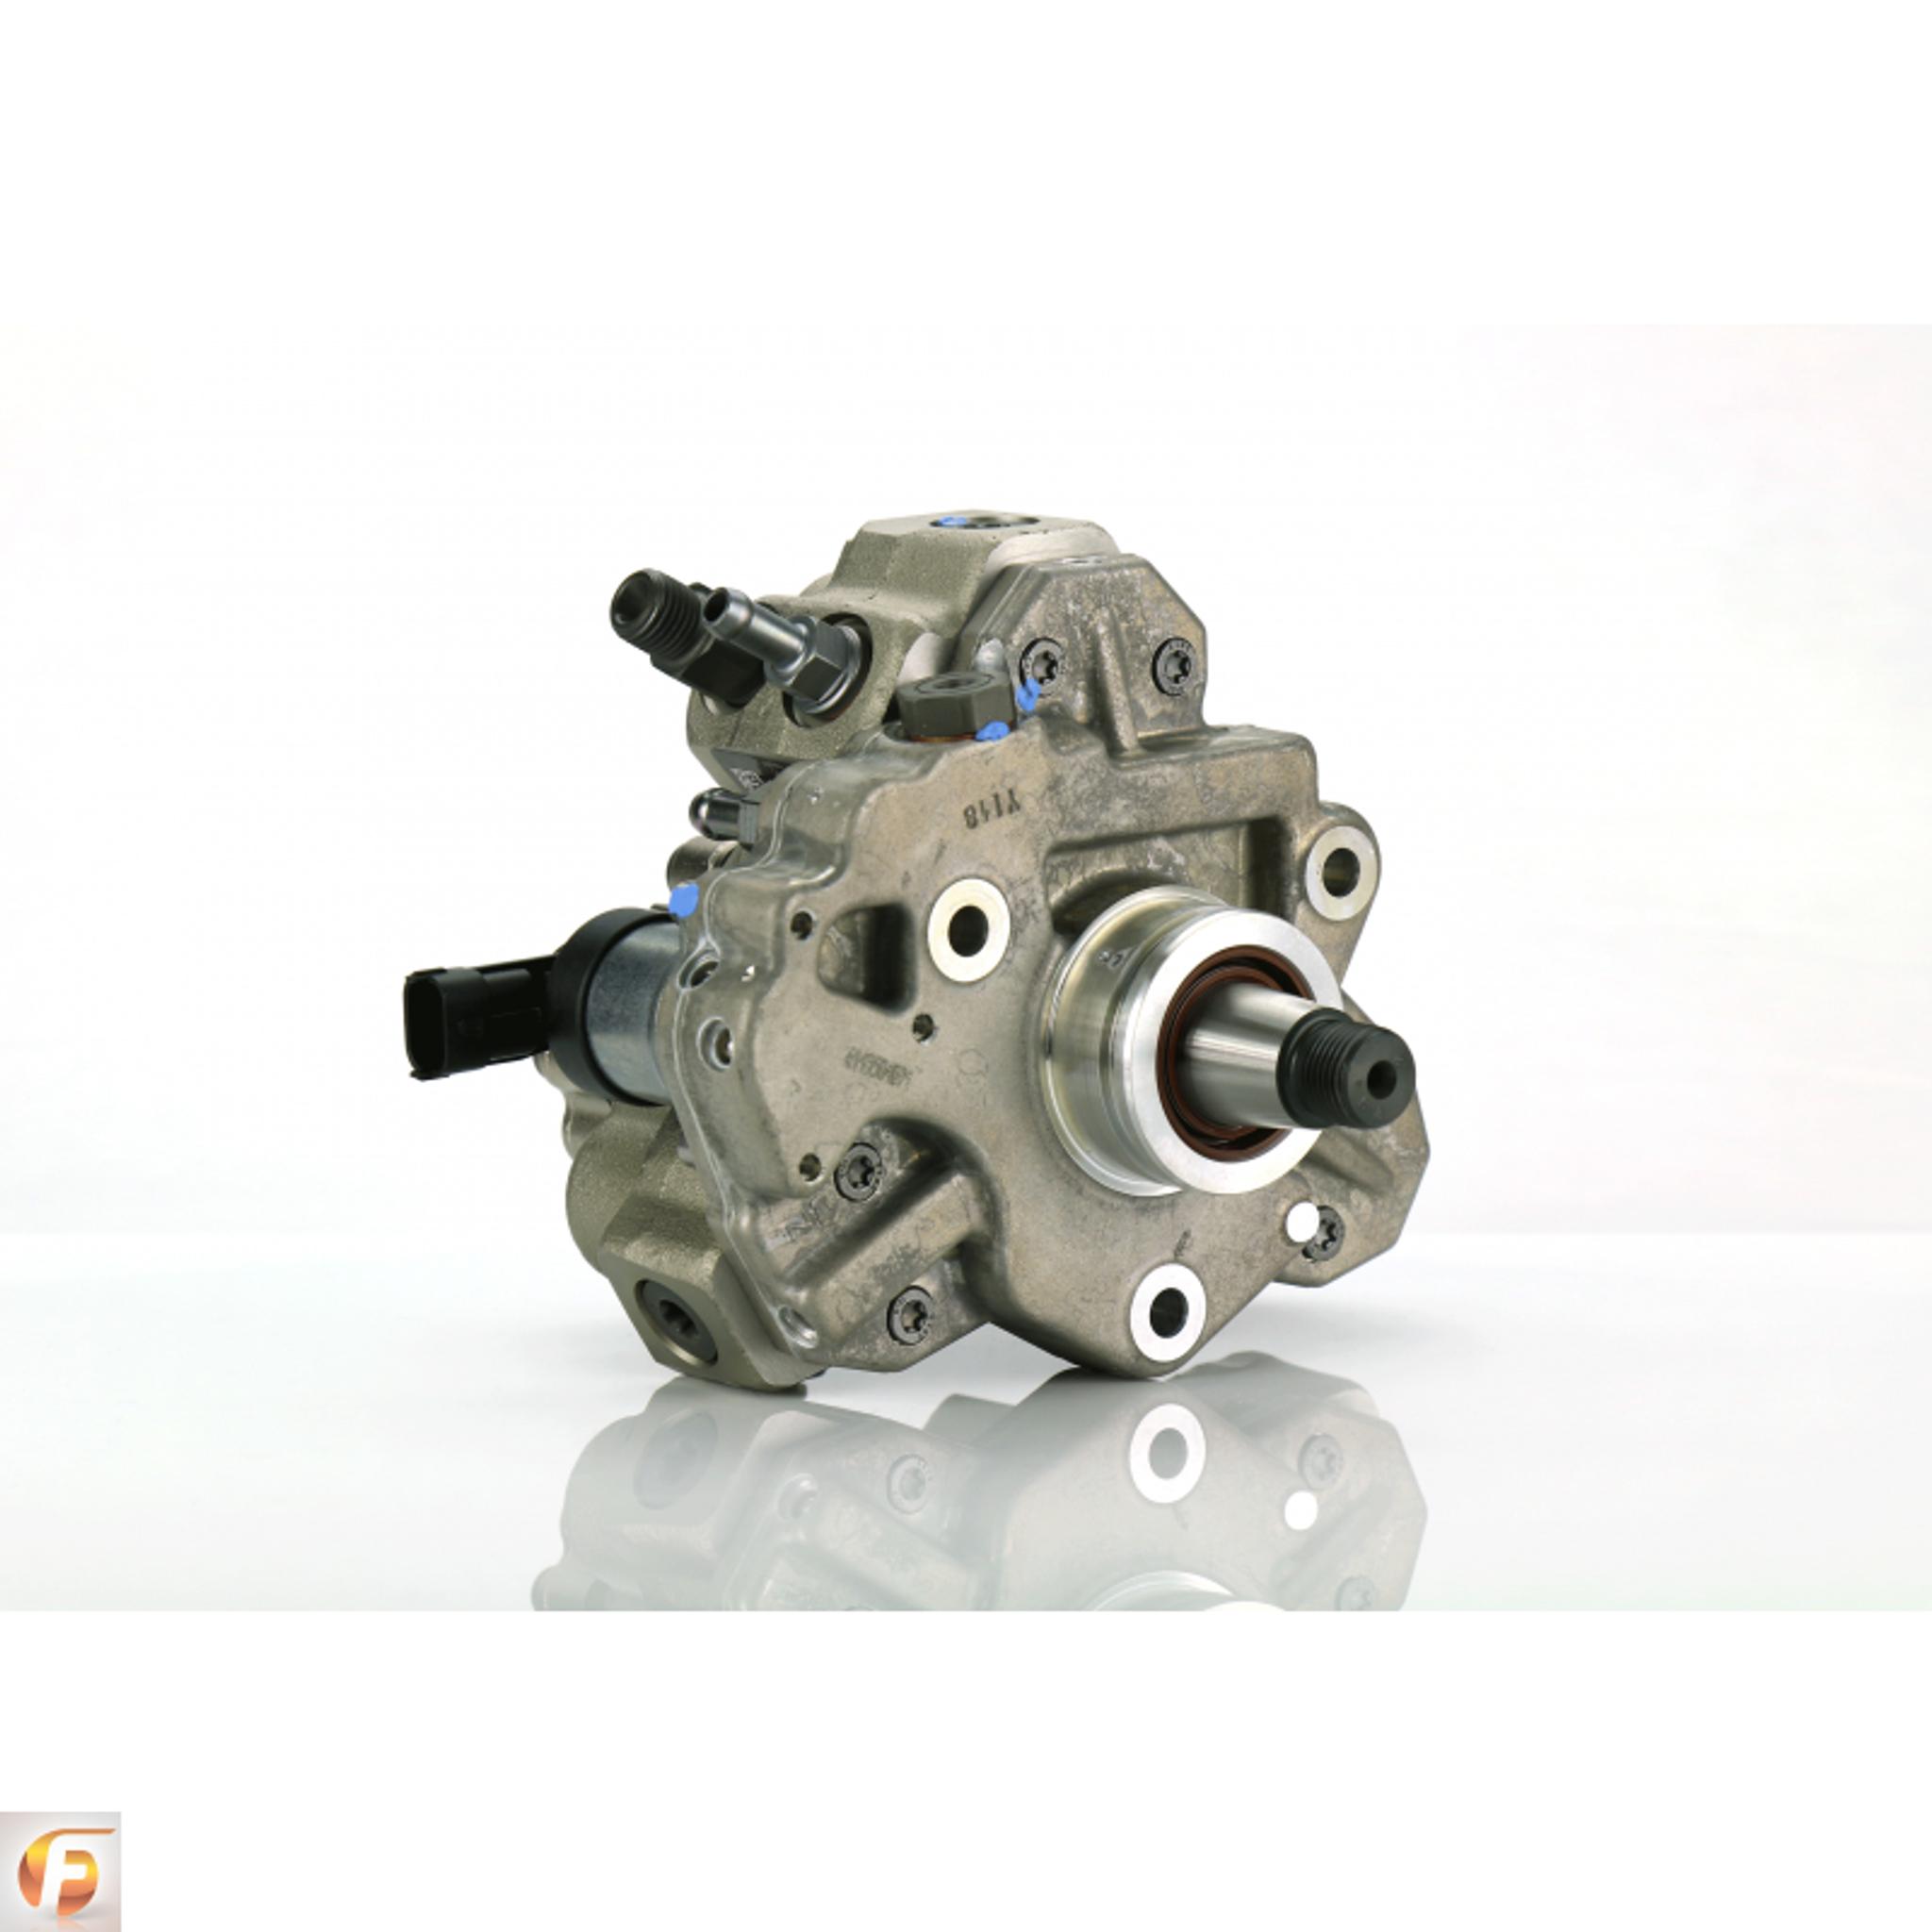 01-16 GM 2500-3500 Duramax FLEECE CP3K (LBZ/LMM Based)